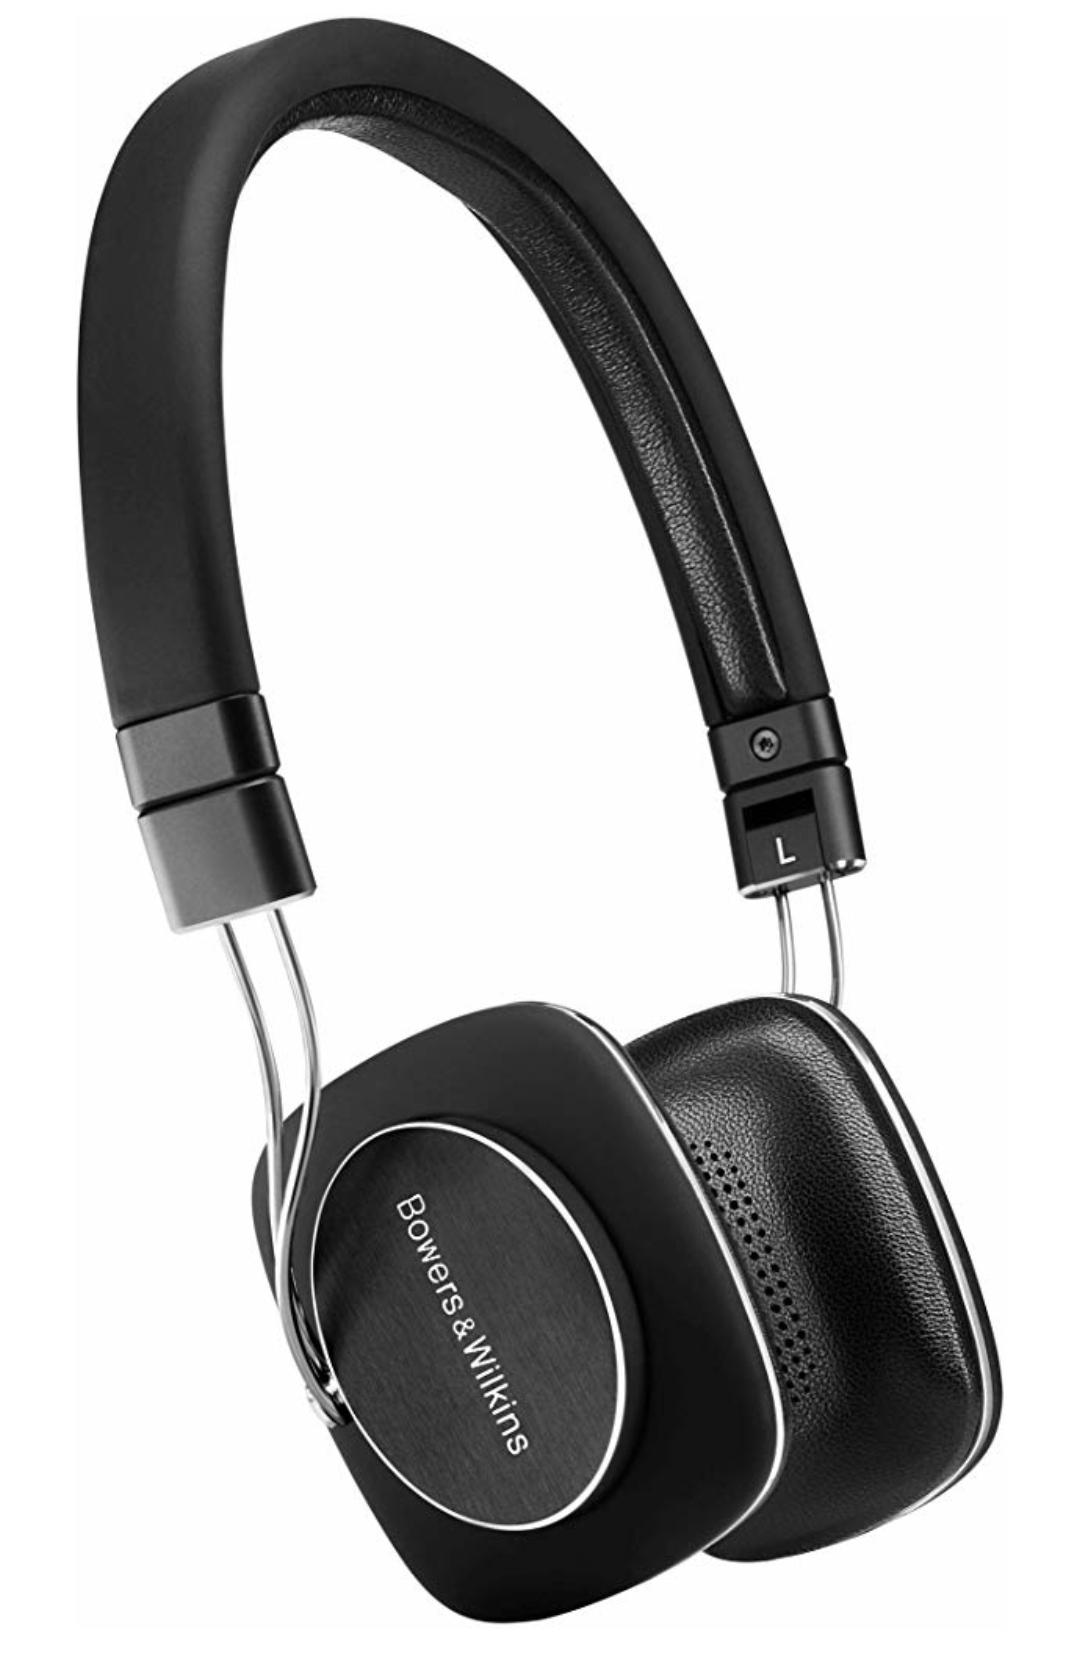 Bowers & Wilkins P3 Serie 2 On-Ear-HiFi-Kopfhörer schwarz [Prime]